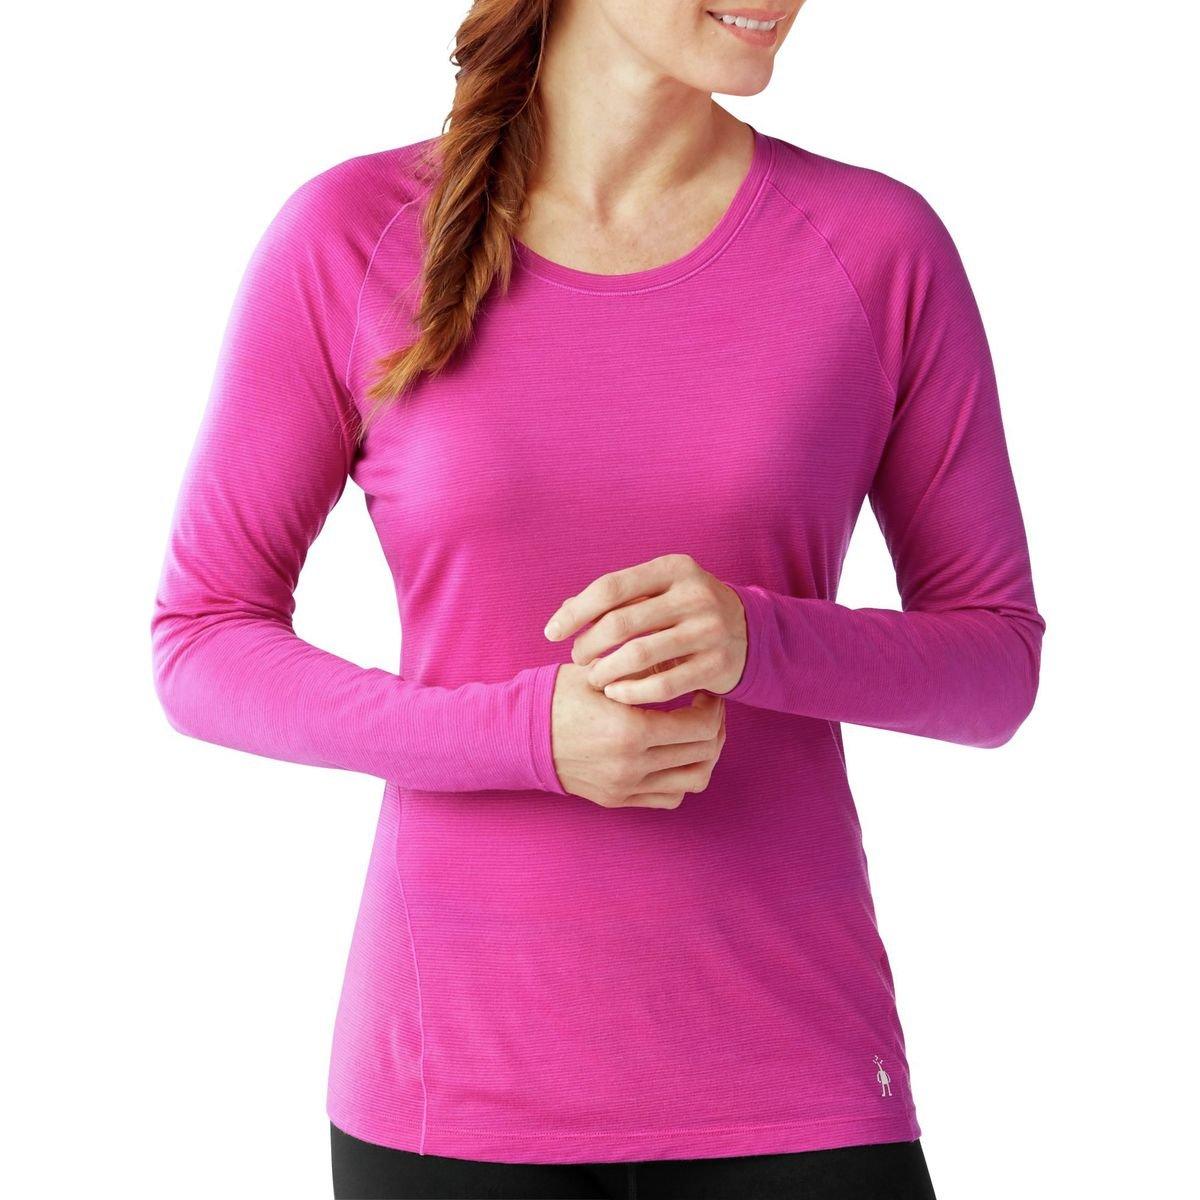 Smartwool Merino 150 Base Layer Pattern Long Sleeve - Women's